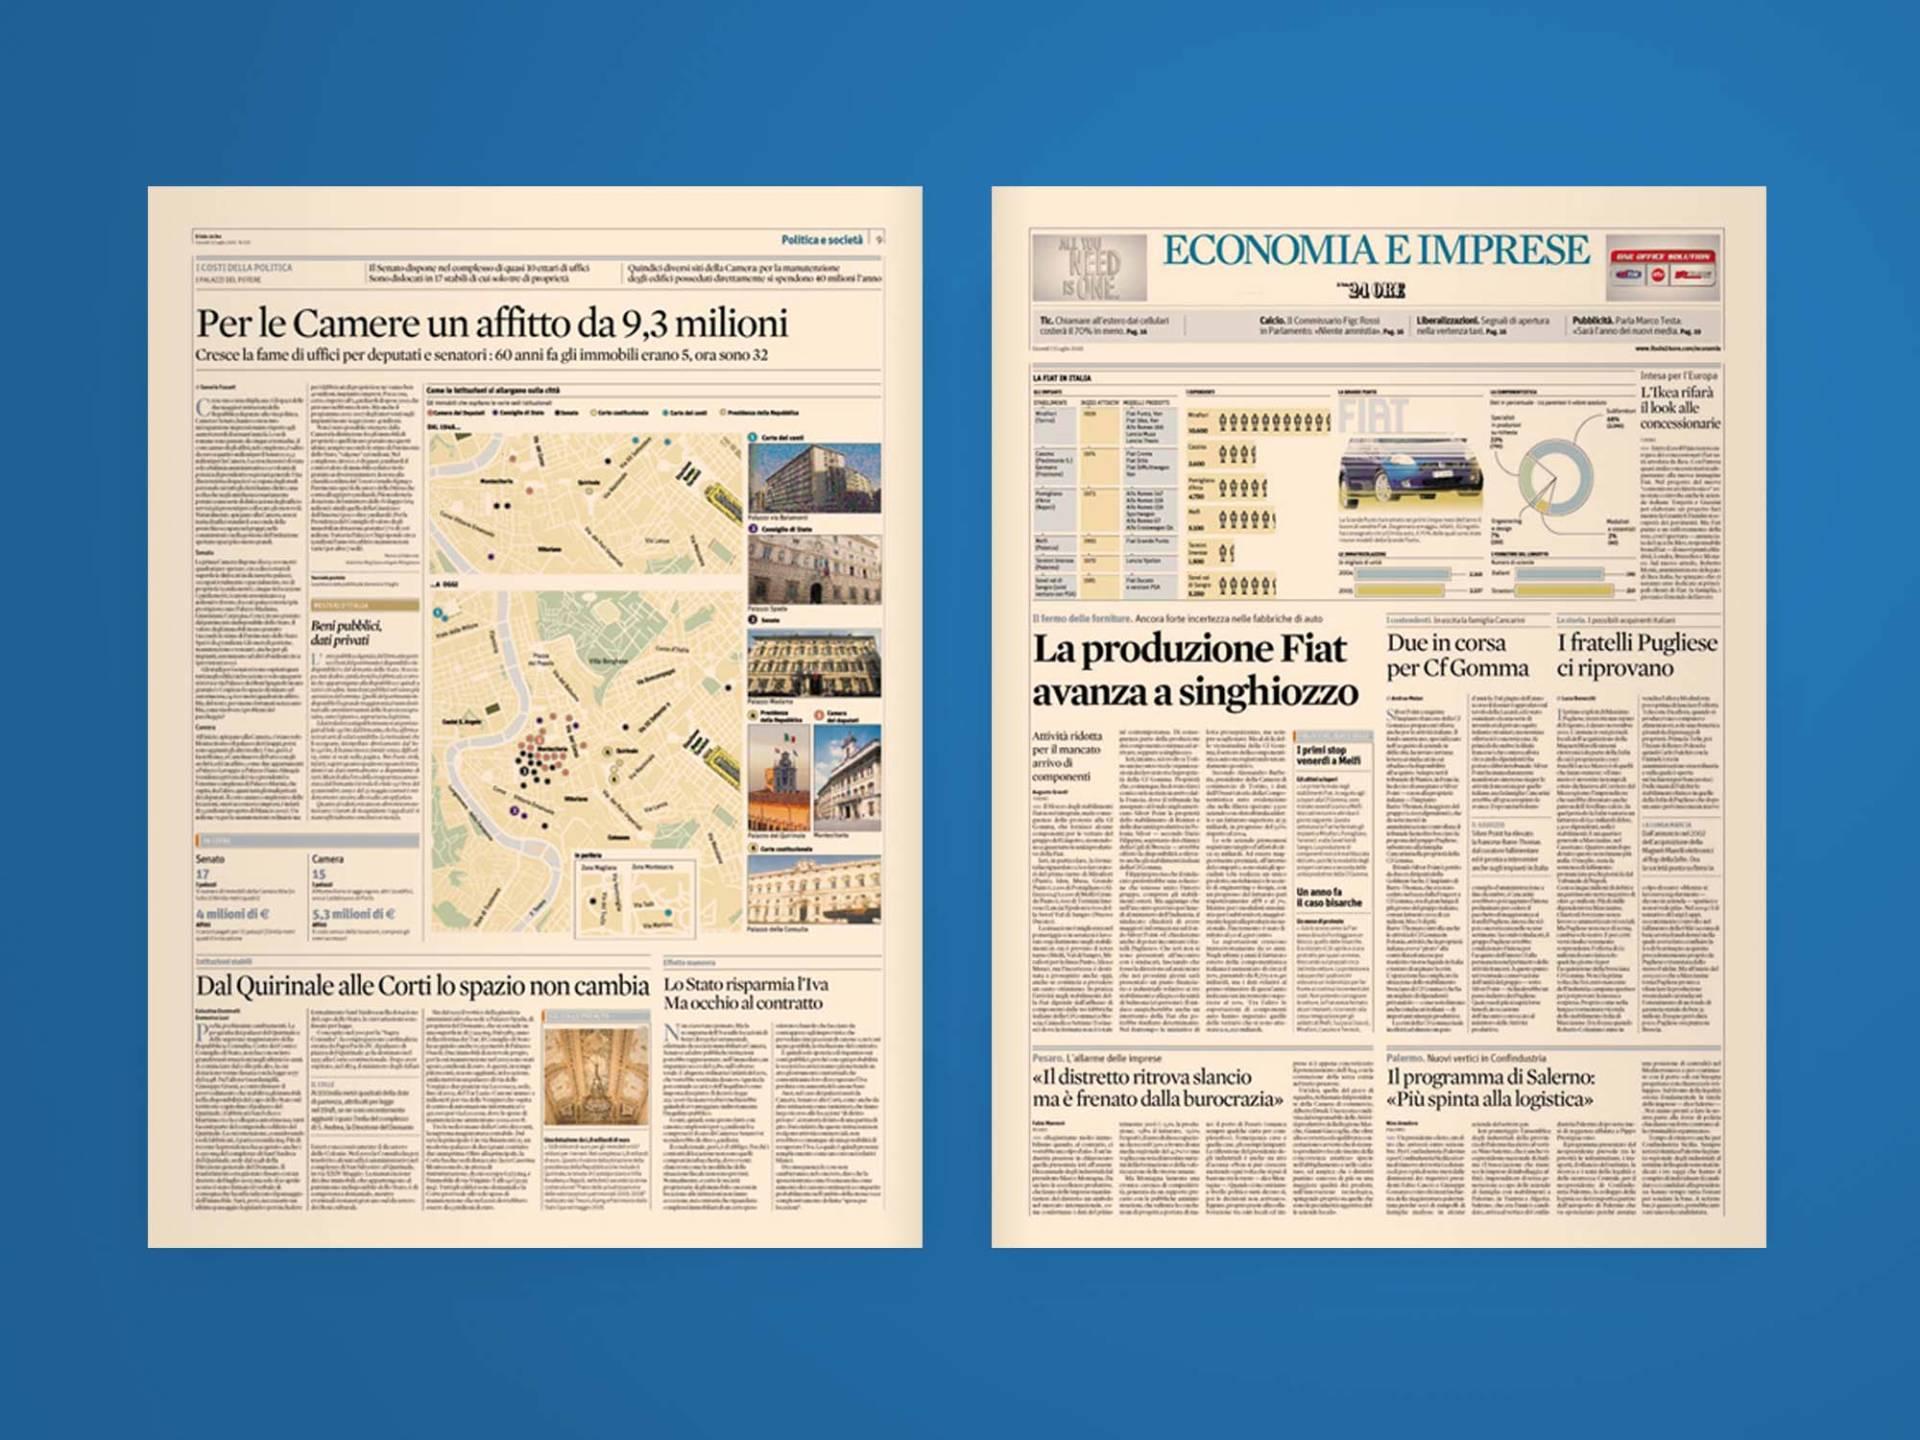 Il_Sole_24_Ore_04_Wenceslau_News_Design